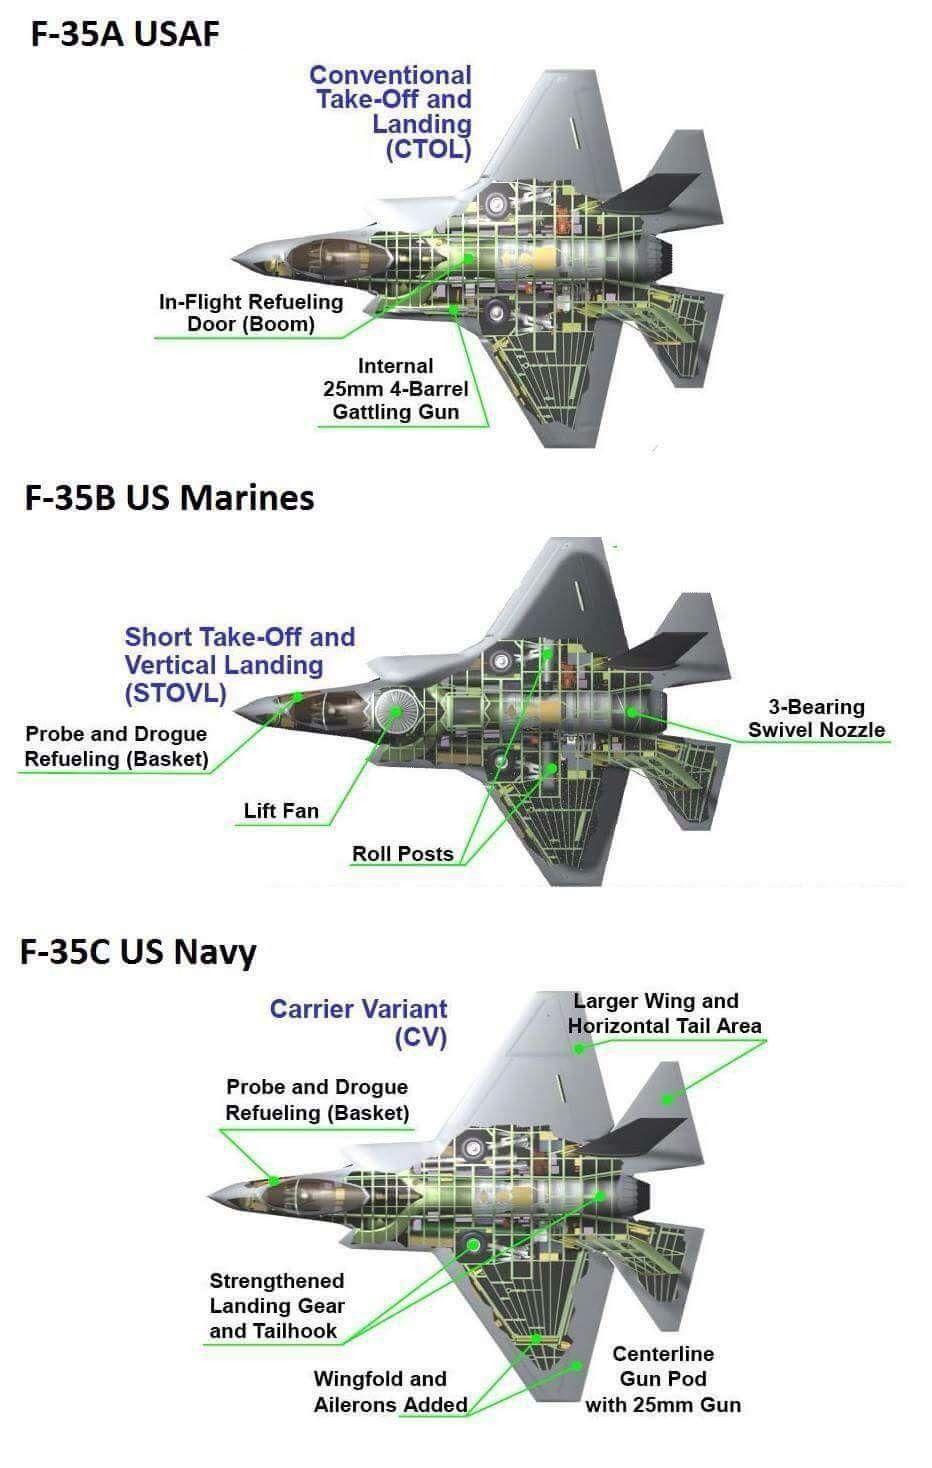 Su-27系列戦闘機総合スレ part.8 [無断転載禁止]©2ch.netYouTube動画>8本 ->画像>224枚